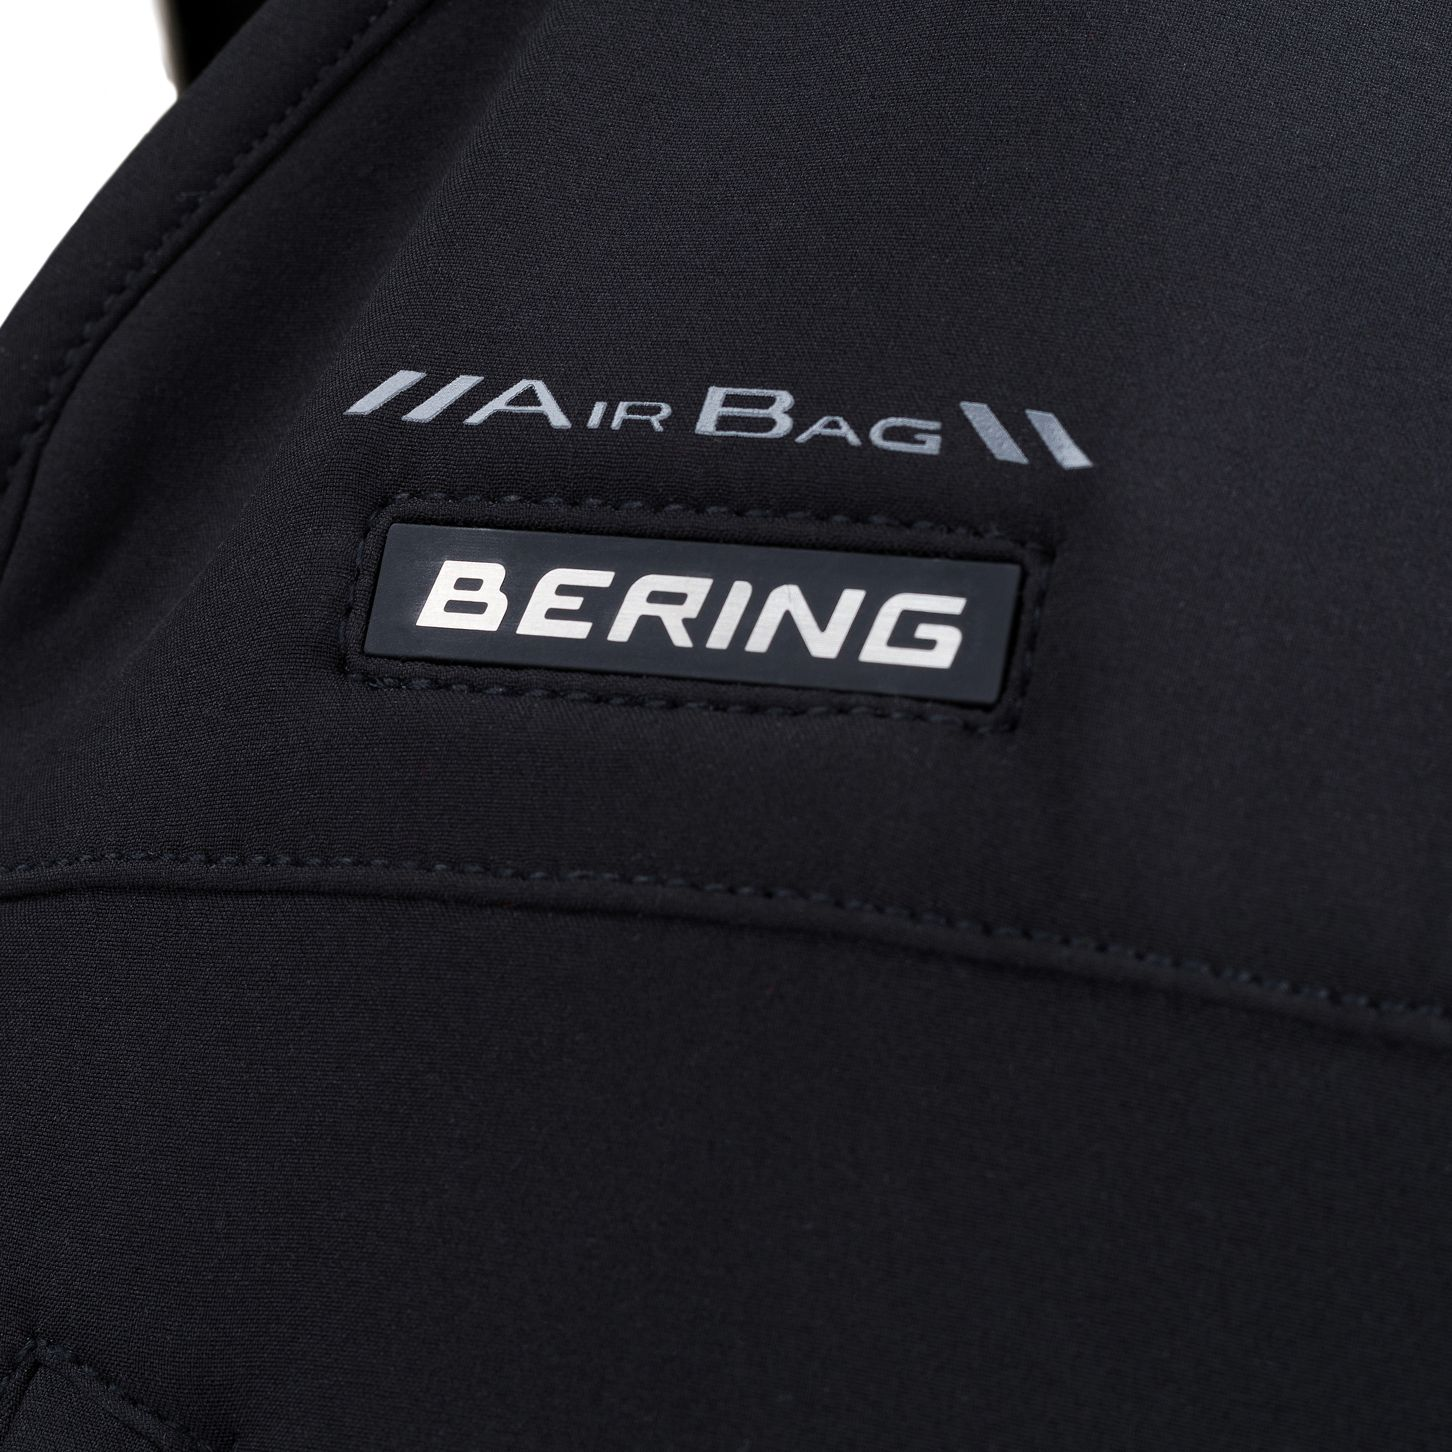 gilet airbag bering c protect air blouson et veste. Black Bedroom Furniture Sets. Home Design Ideas